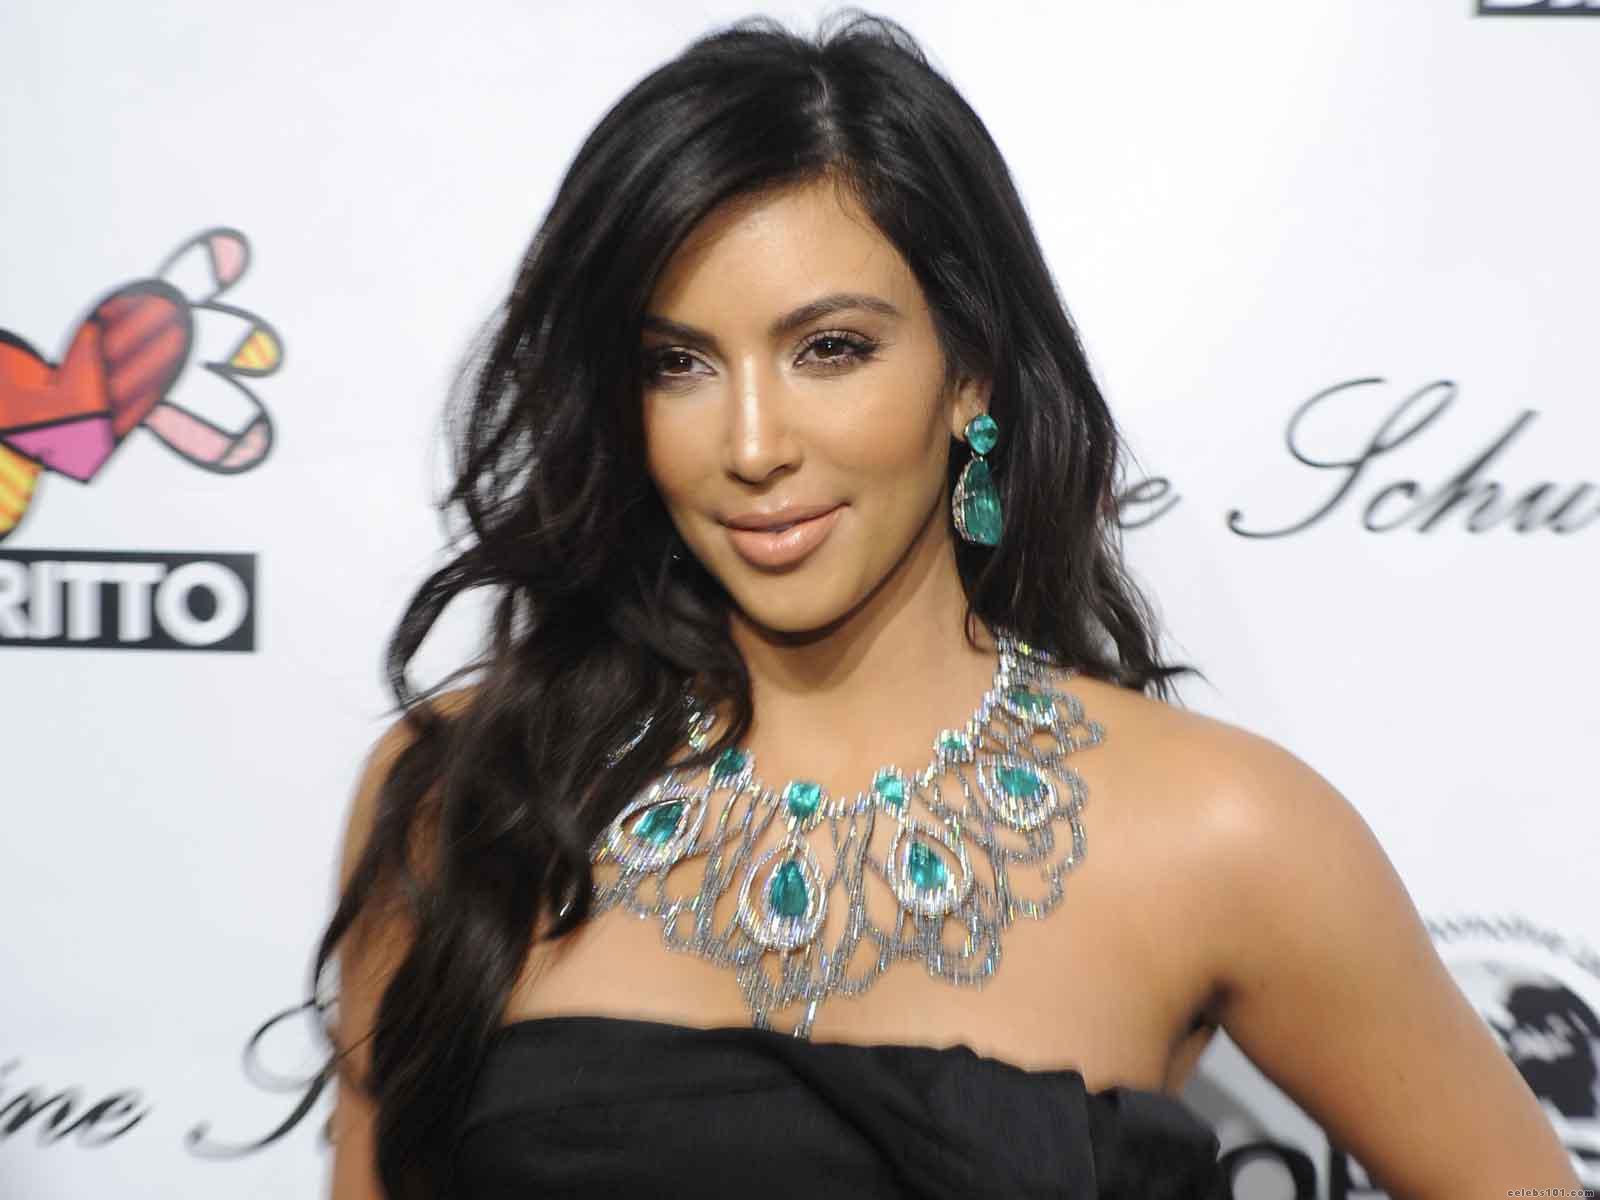 Kim Kardashian Wallpaper 3099 Hd Wallpapers in Celebrities F 1600x1200